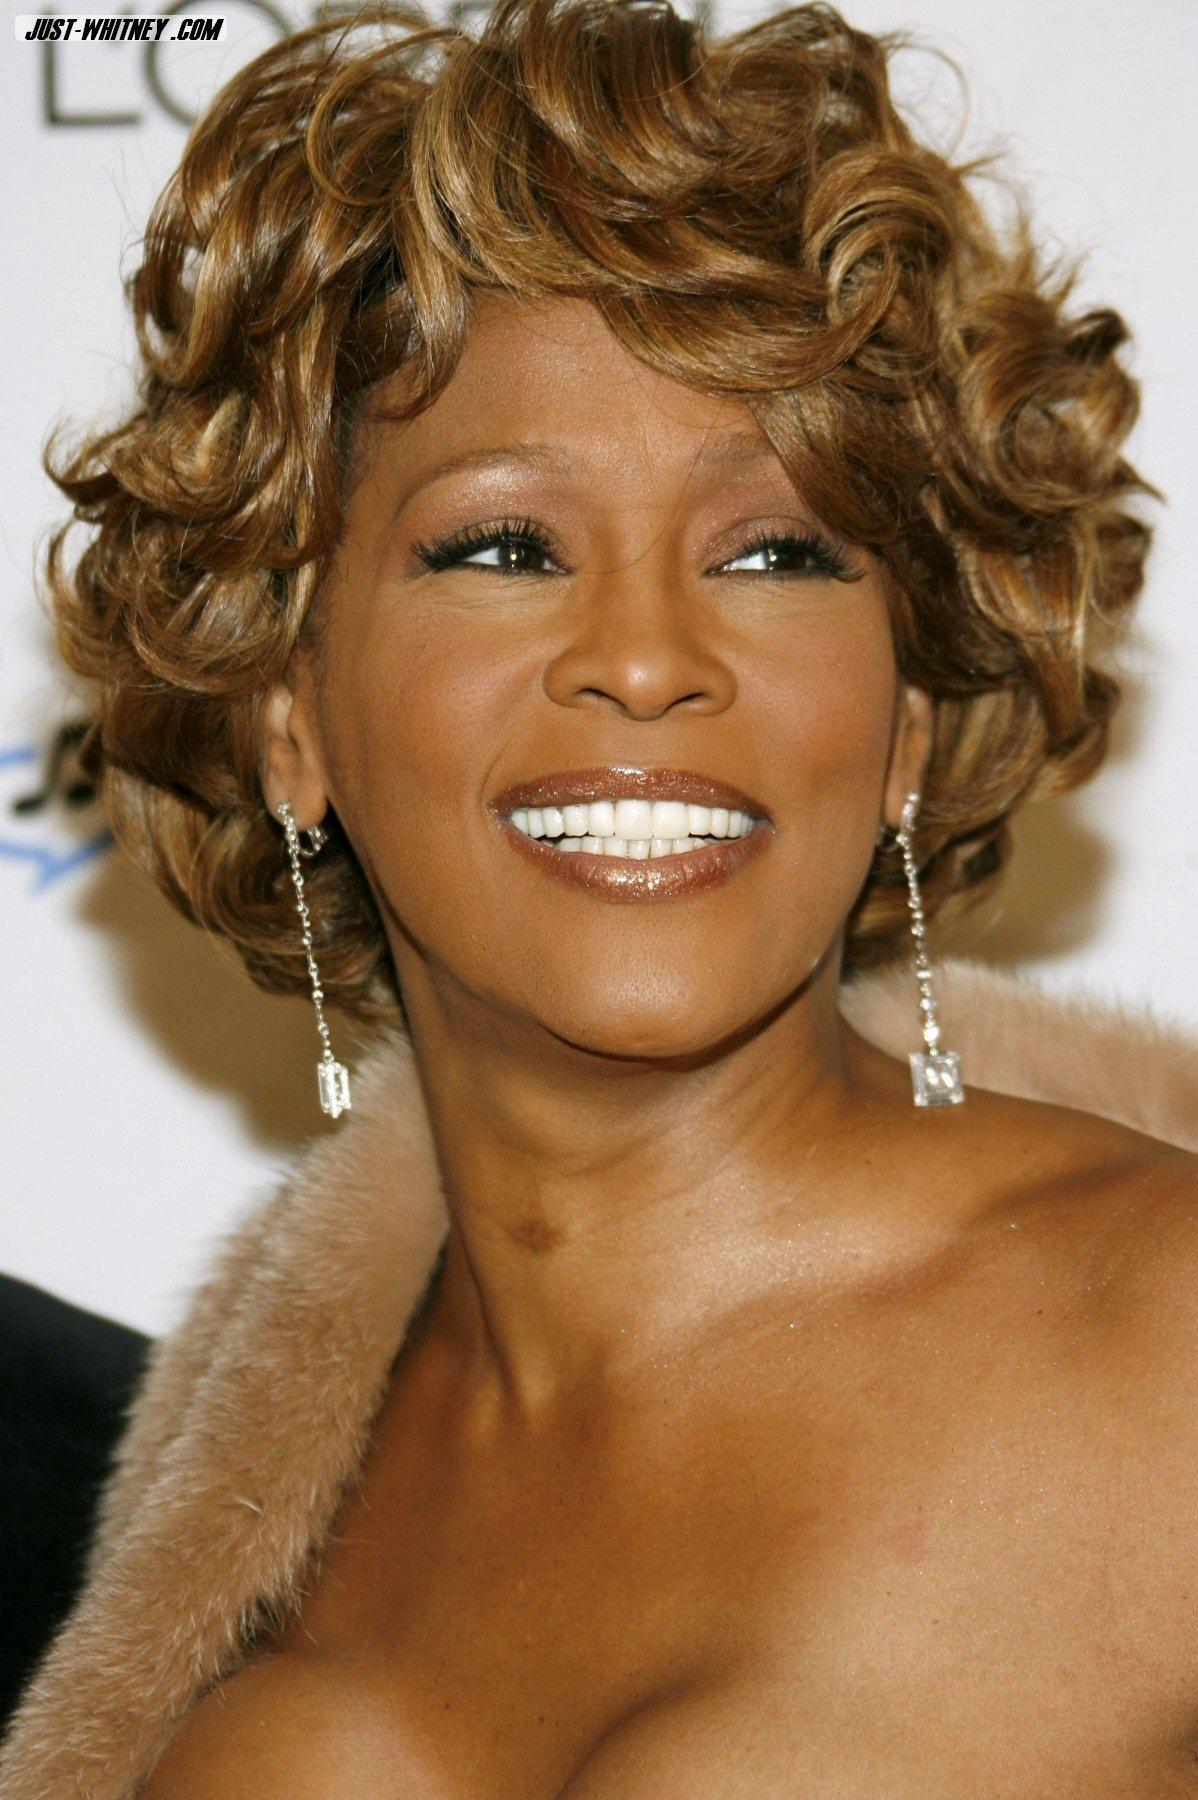 Whitney Houston HD sexy wallpaper